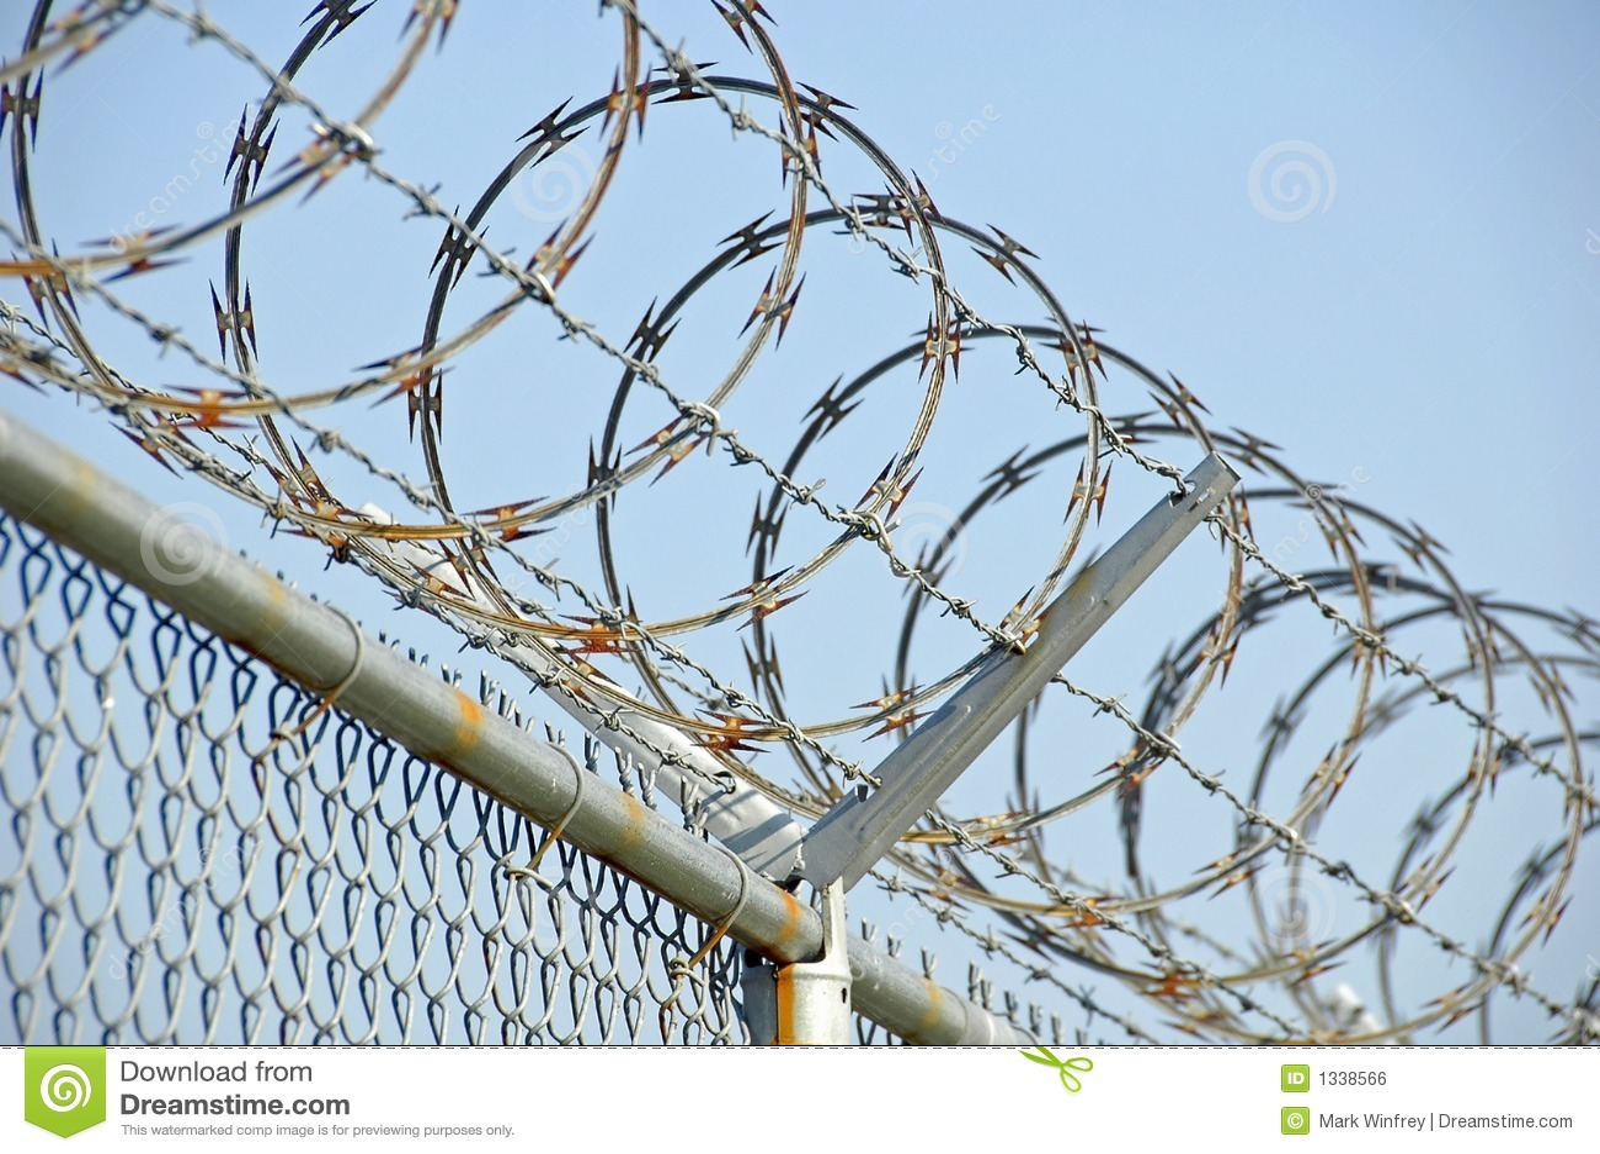 Razor Wire 2 stock photo. Image of boundary, cross, field - 1338566